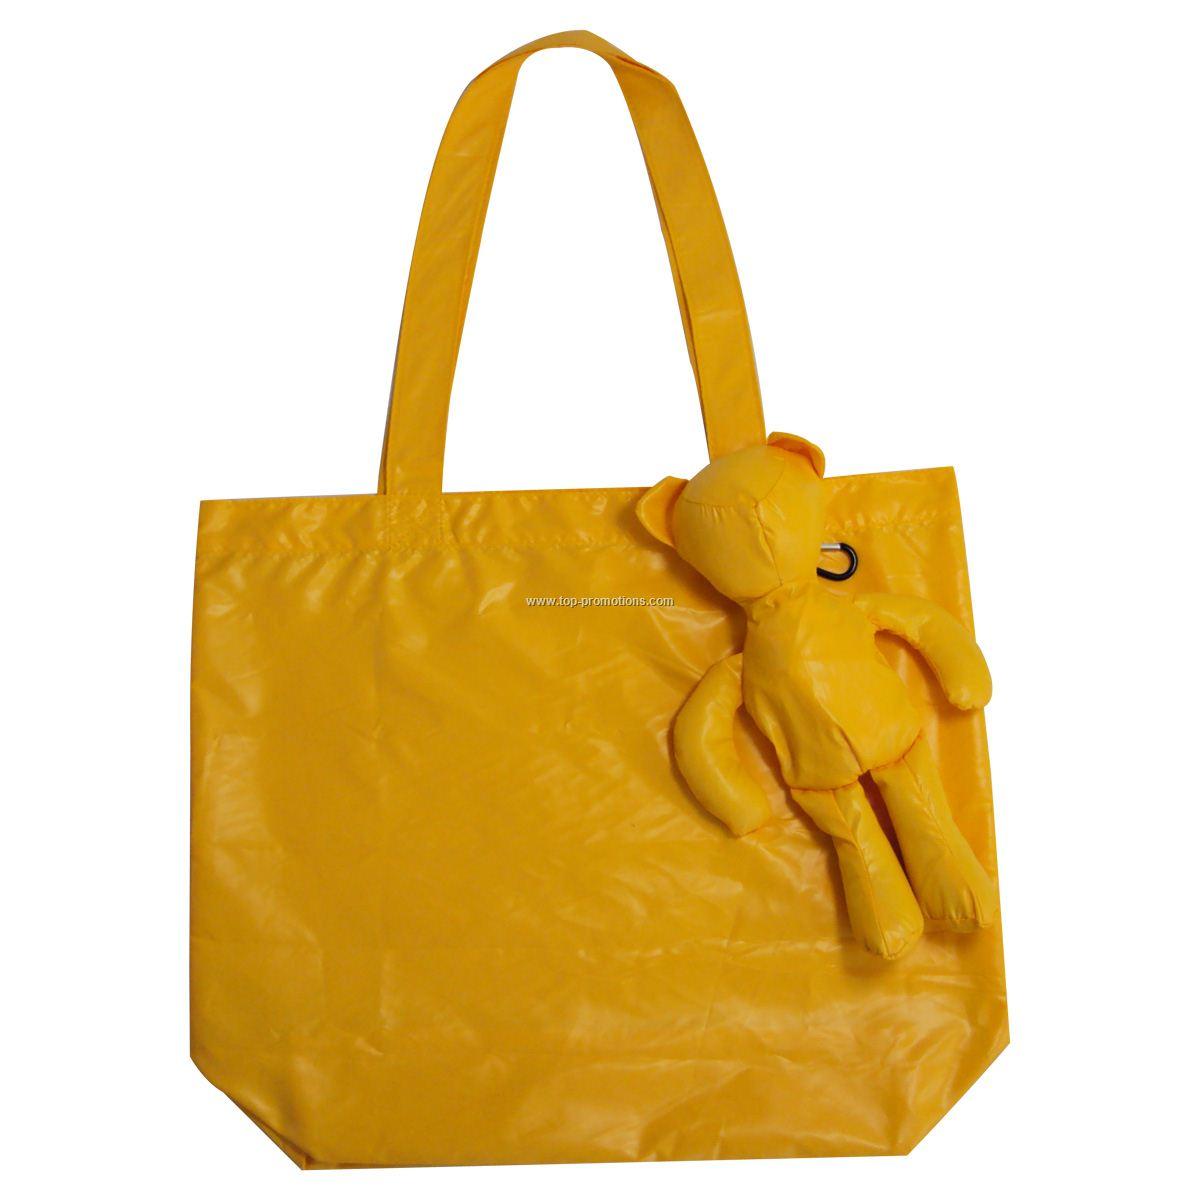 Bear Shopping bags